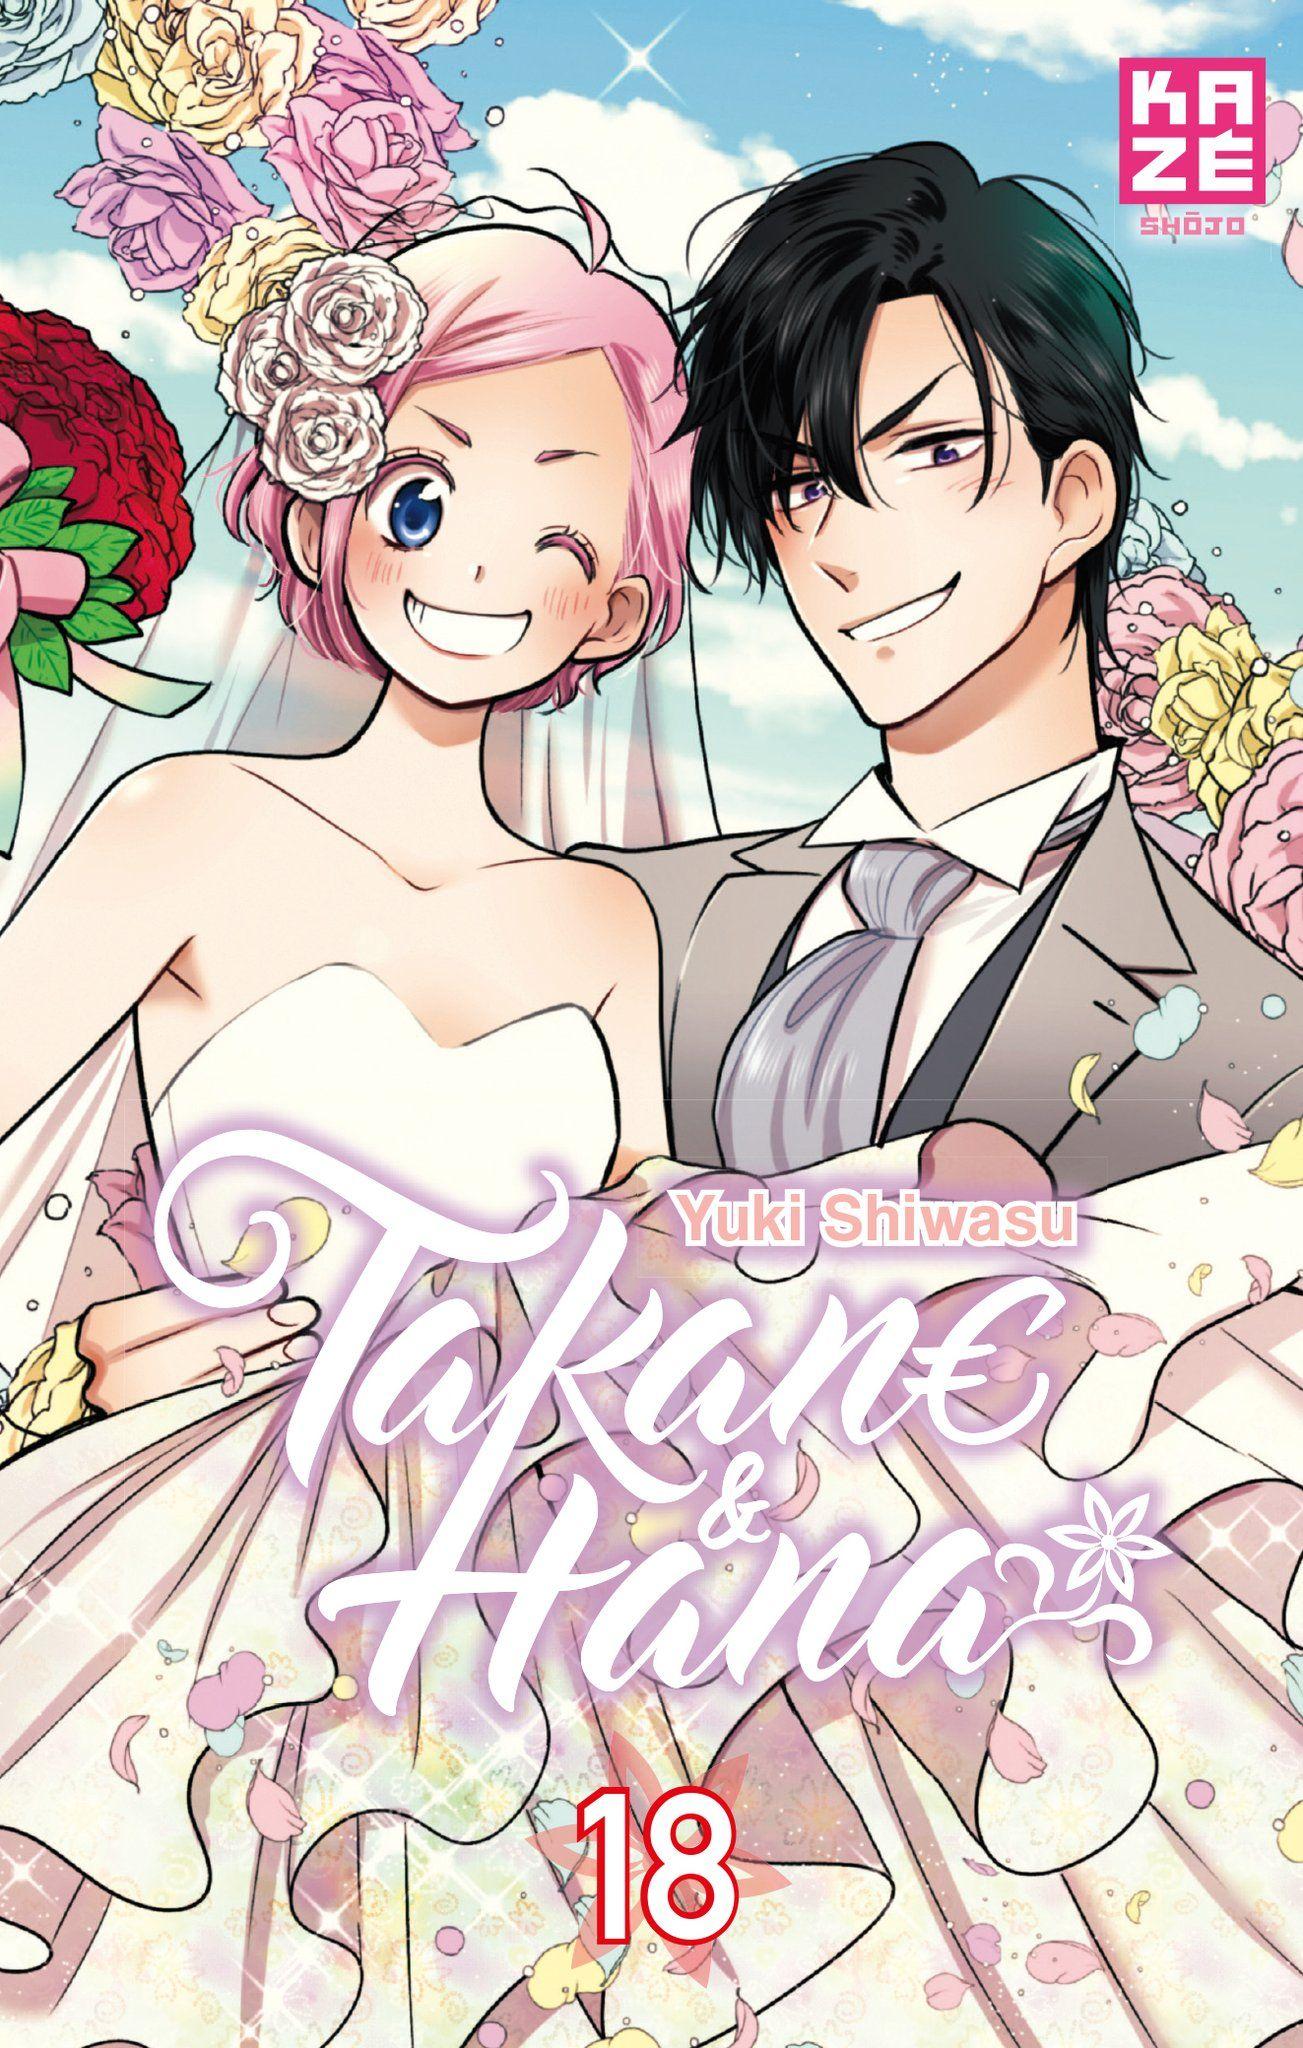 Sortie Manga au Québec JUIN 2021 Takane-Hana-18-kaze